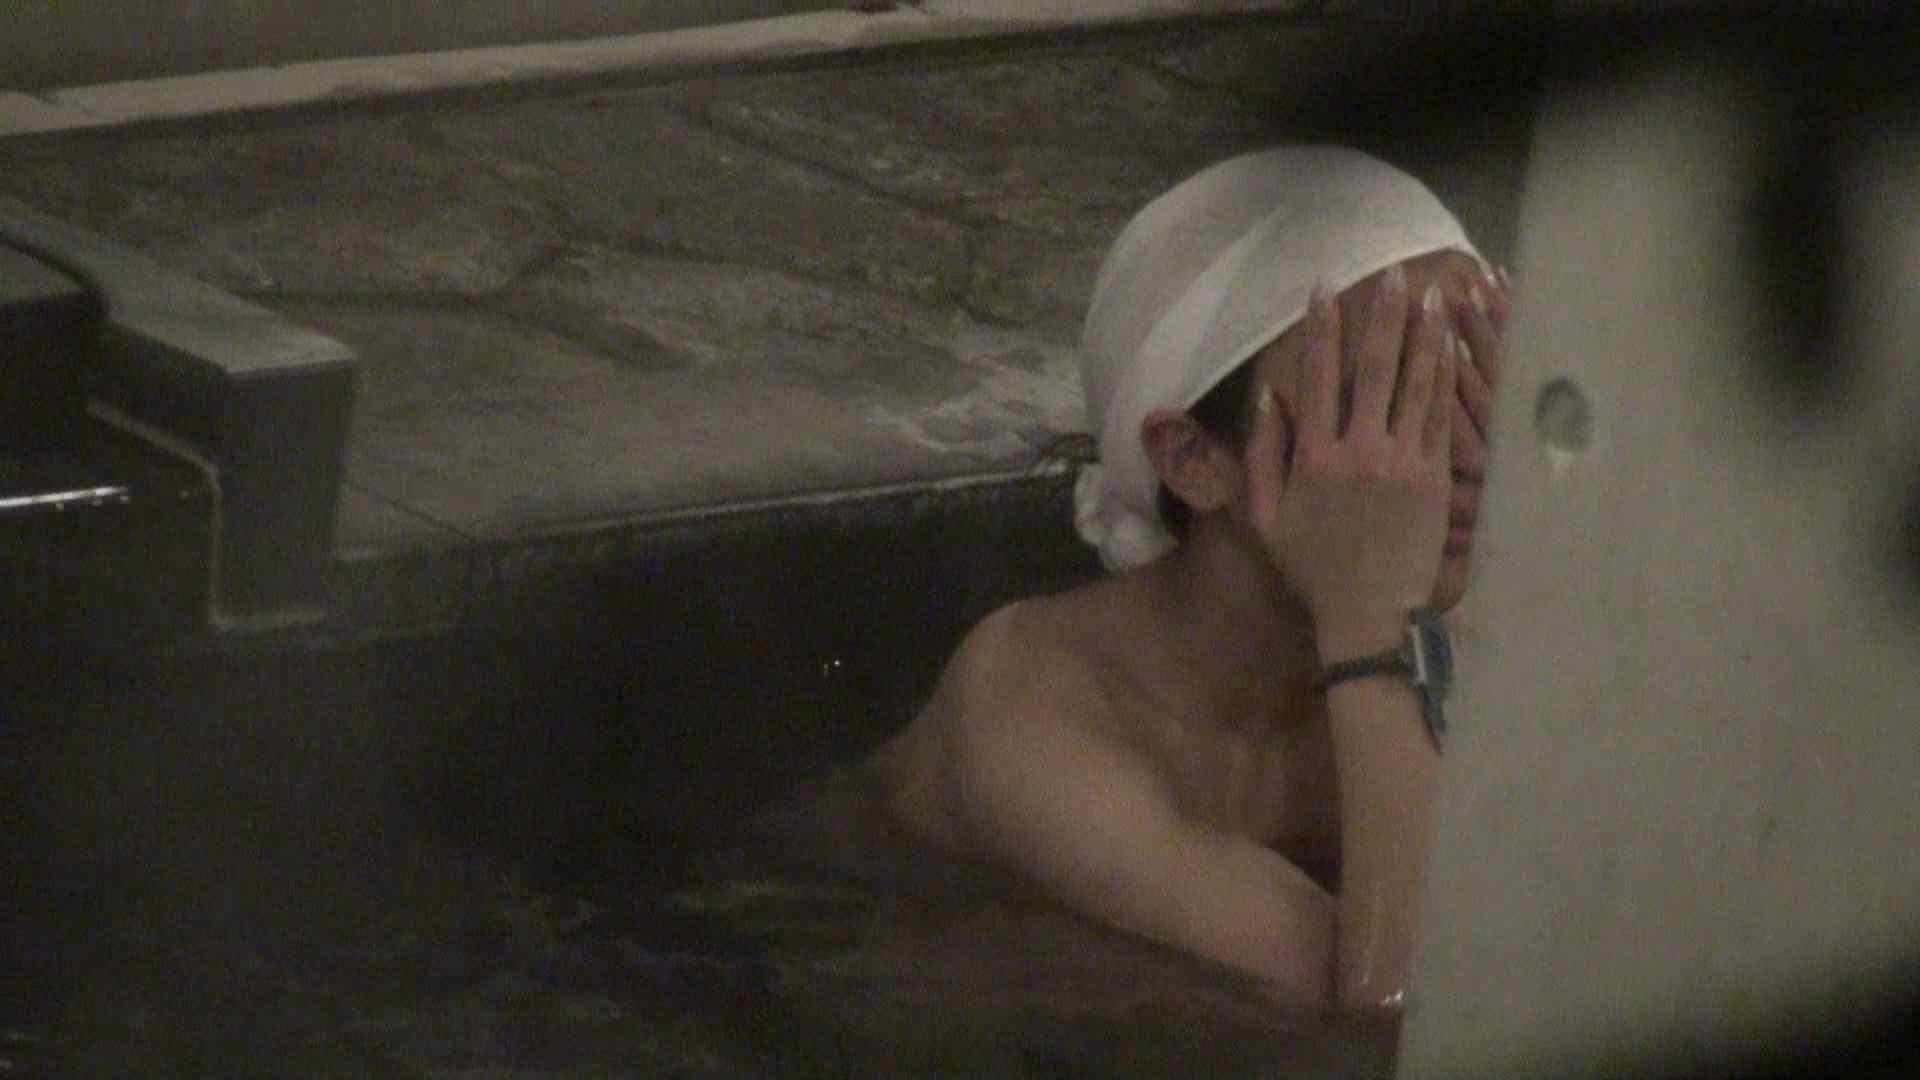 Aquaな露天風呂Vol.427 盗撮 AV動画キャプチャ 51画像 38